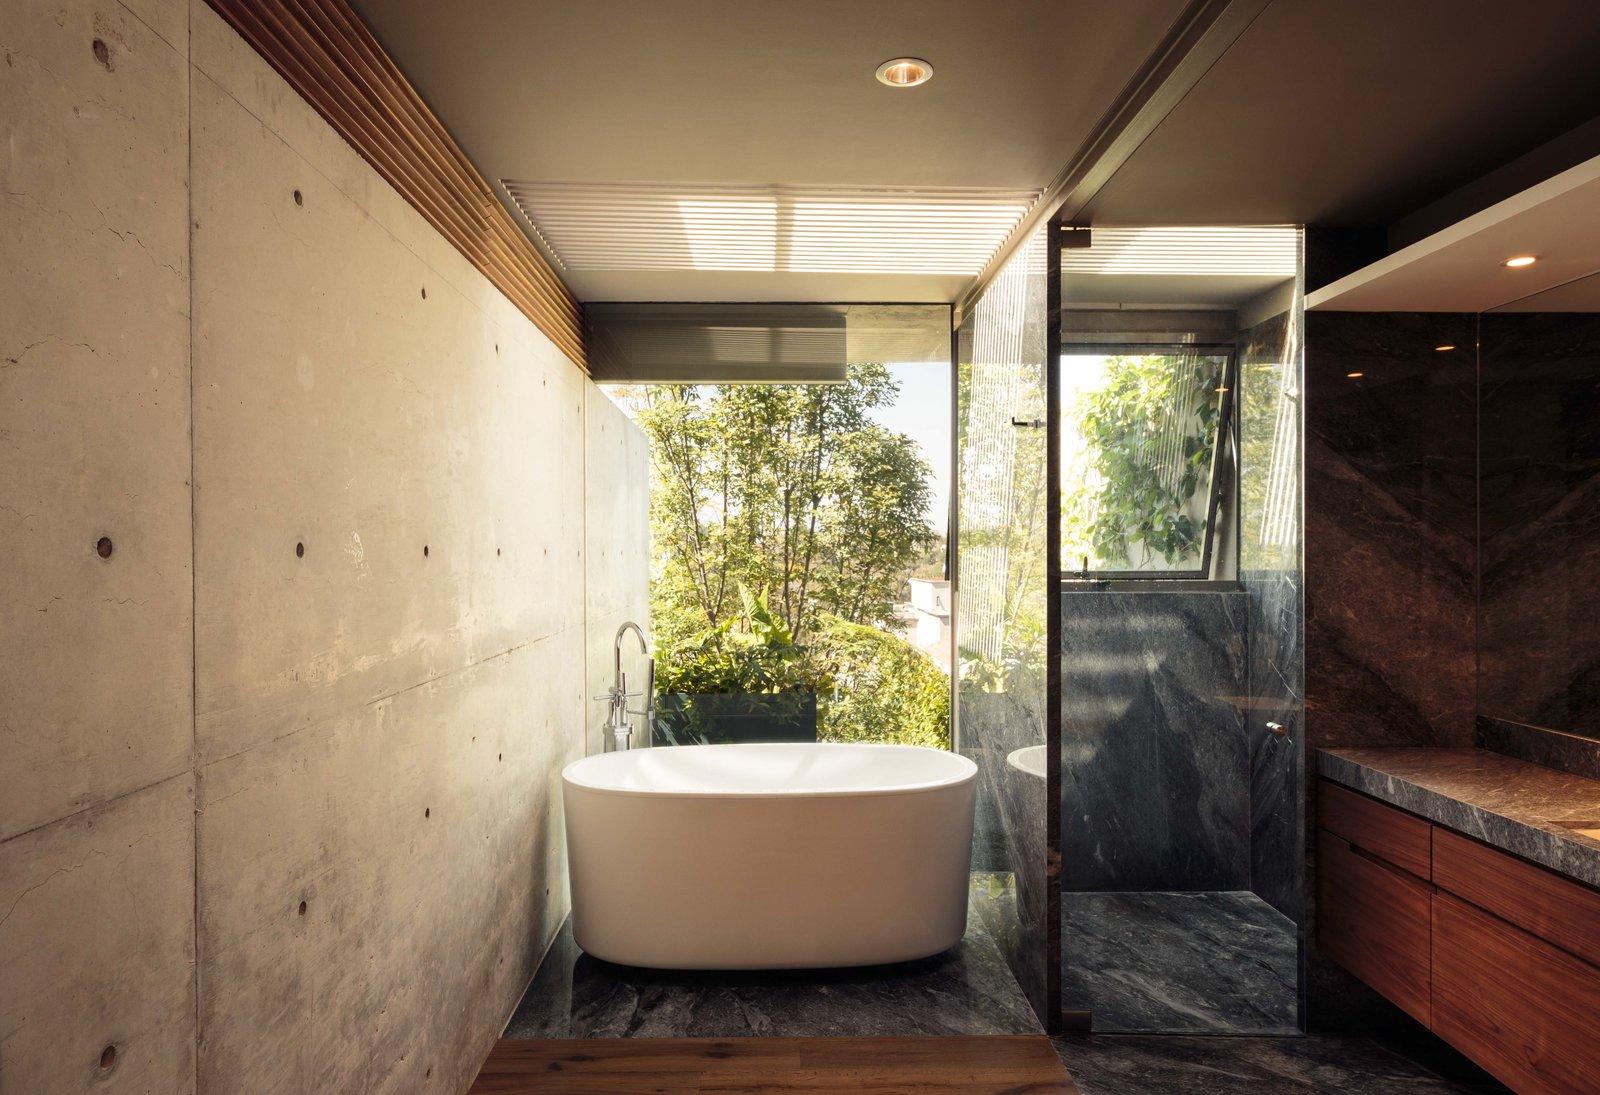 CAUCASO Tagged: Bath Room, Granite Counter, Medium Hardwood Floor, Soaking Tub, Enclosed Shower, Freestanding Tub, Recessed Lighting, and Concrete Wall.  Caucaso by Jose Juan Rivera Rio